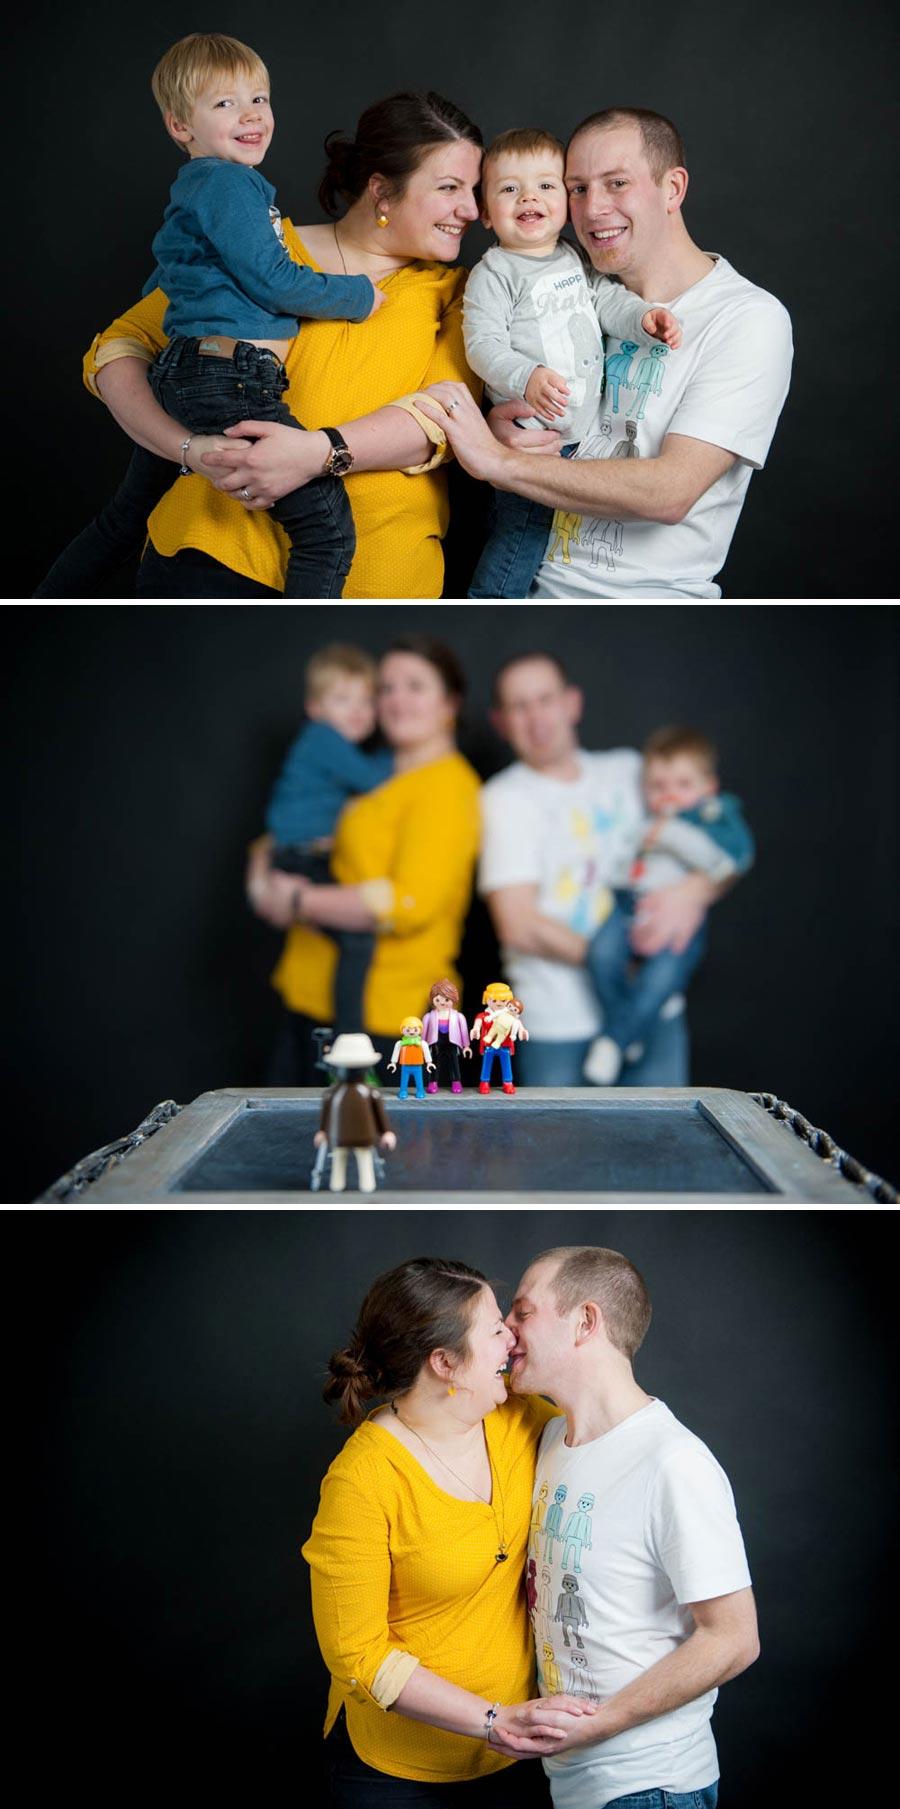 séance-photo-studio-famille-oise